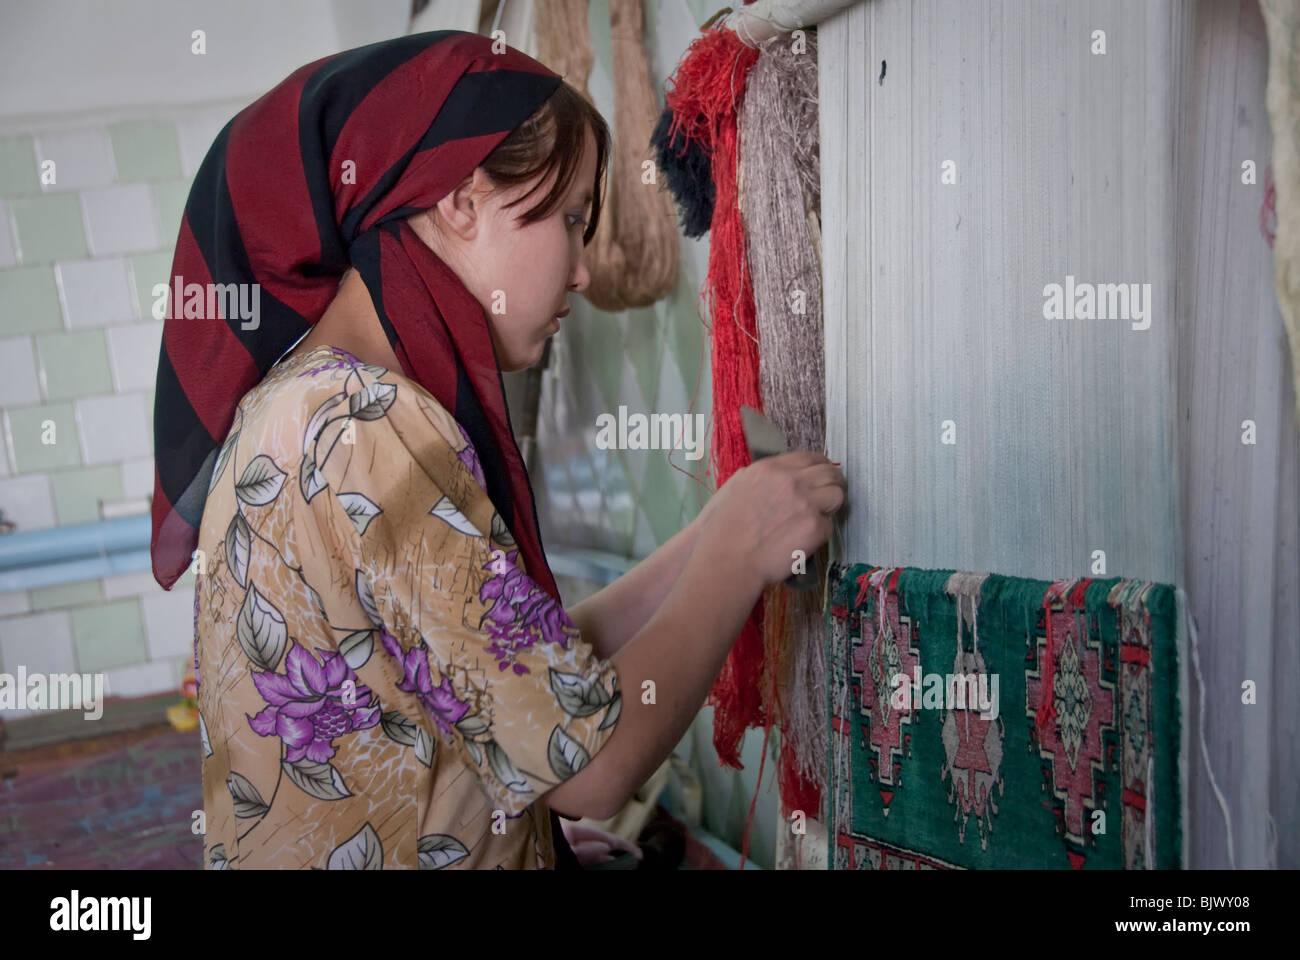 Young woman weaving a silk carpet in a Carpet Factory in Uzbekistan. - Stock Image